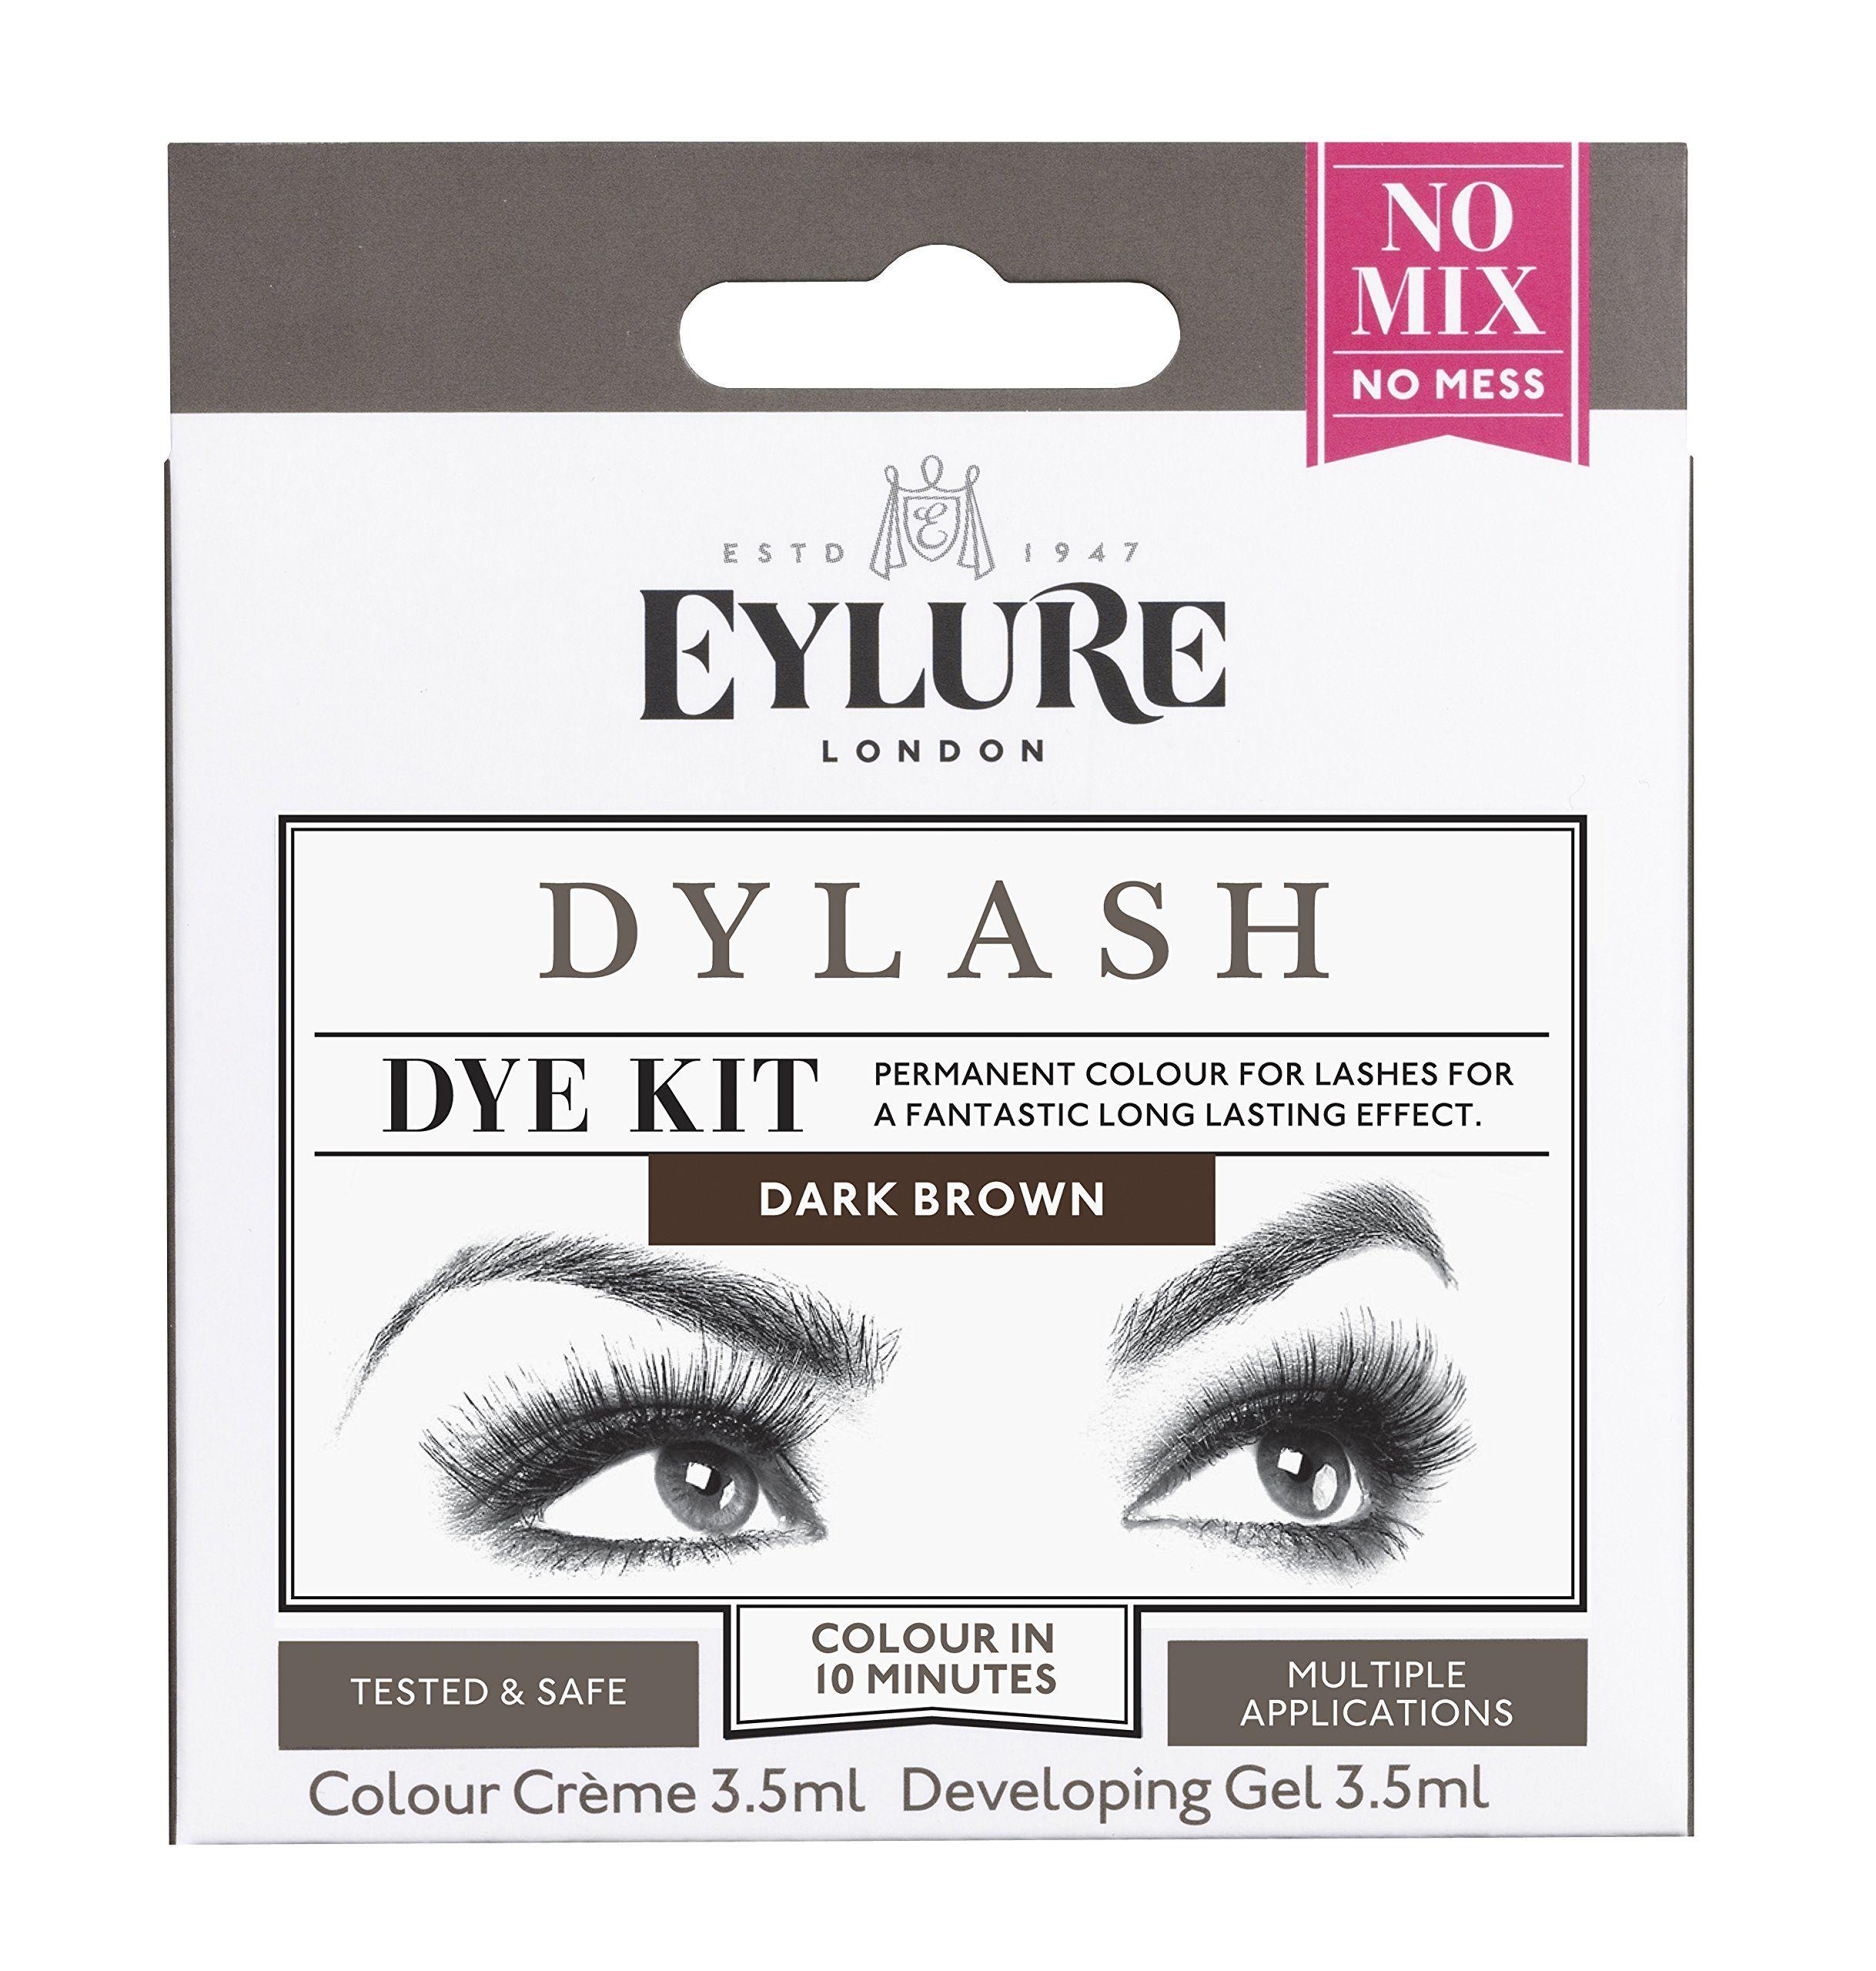 91d8cba930e Eylure Pro-Lash Dylash, Dark Brown. Eylure Pro-Lash Dylash, Dark Brown.